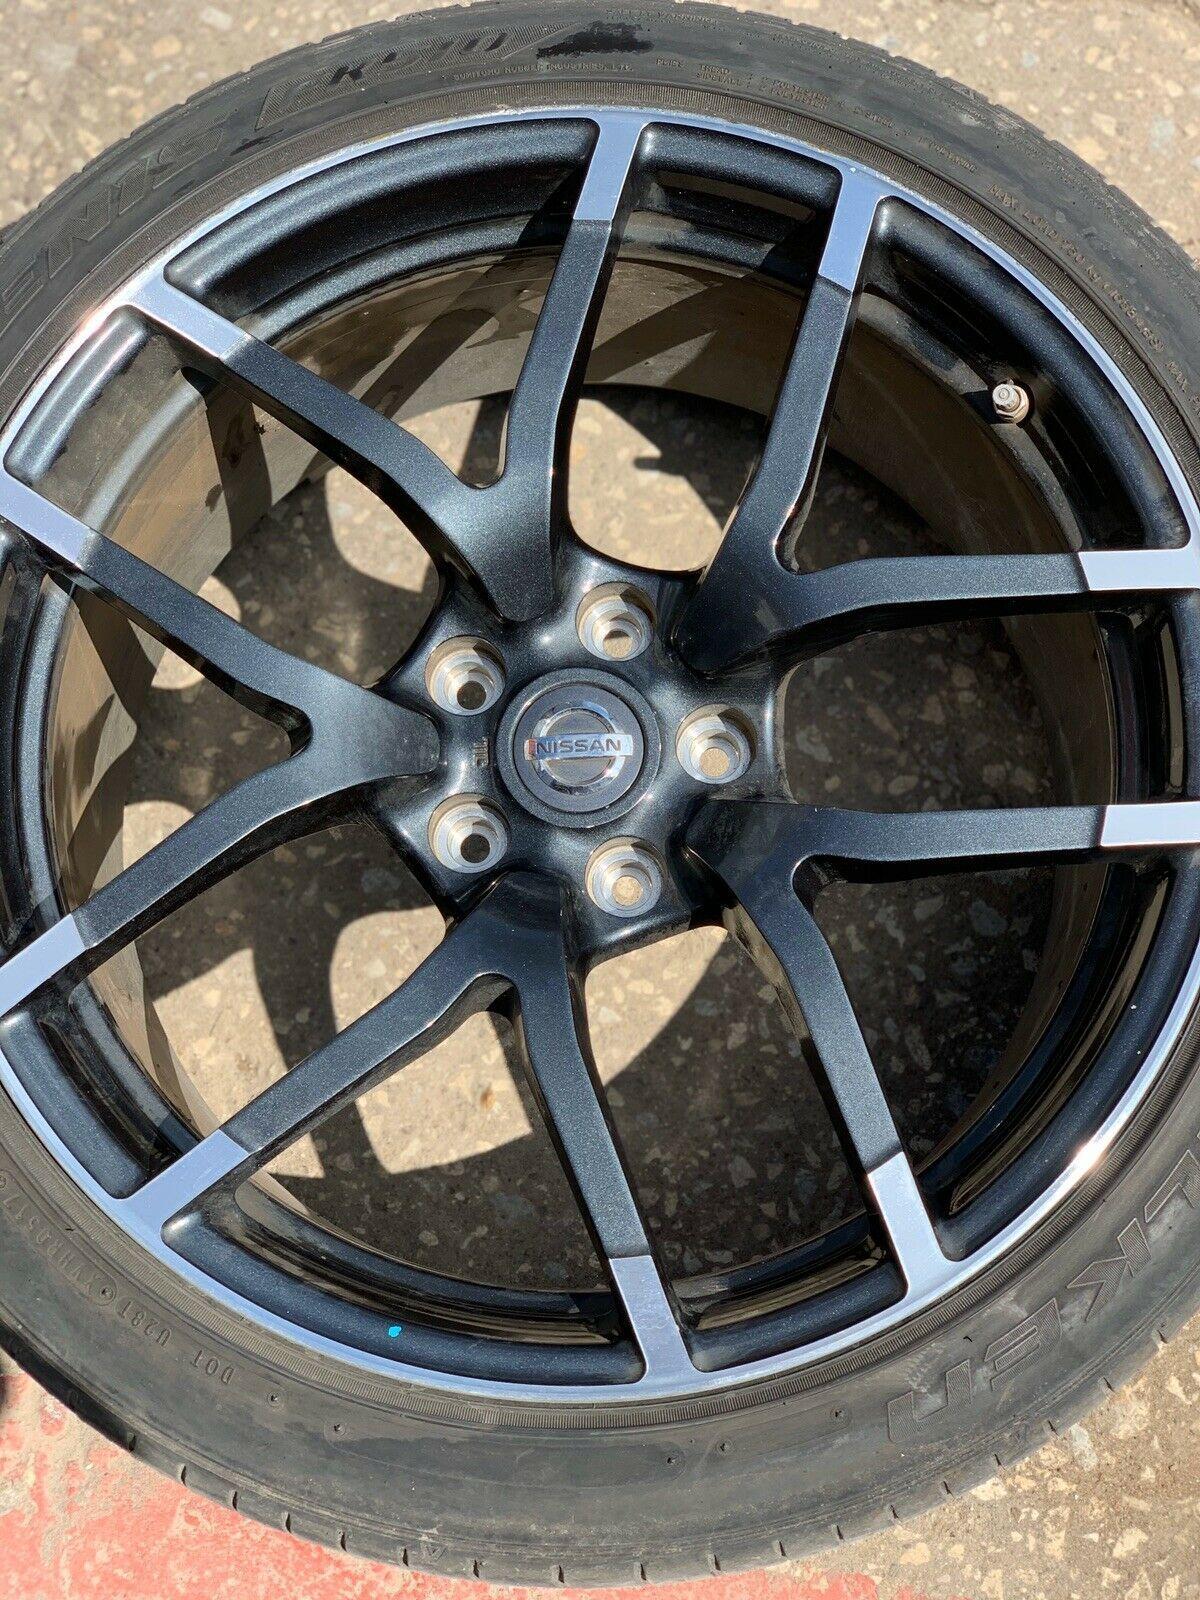 370z Nismo Wheels 370z Nismo Wheel Rims And Tires